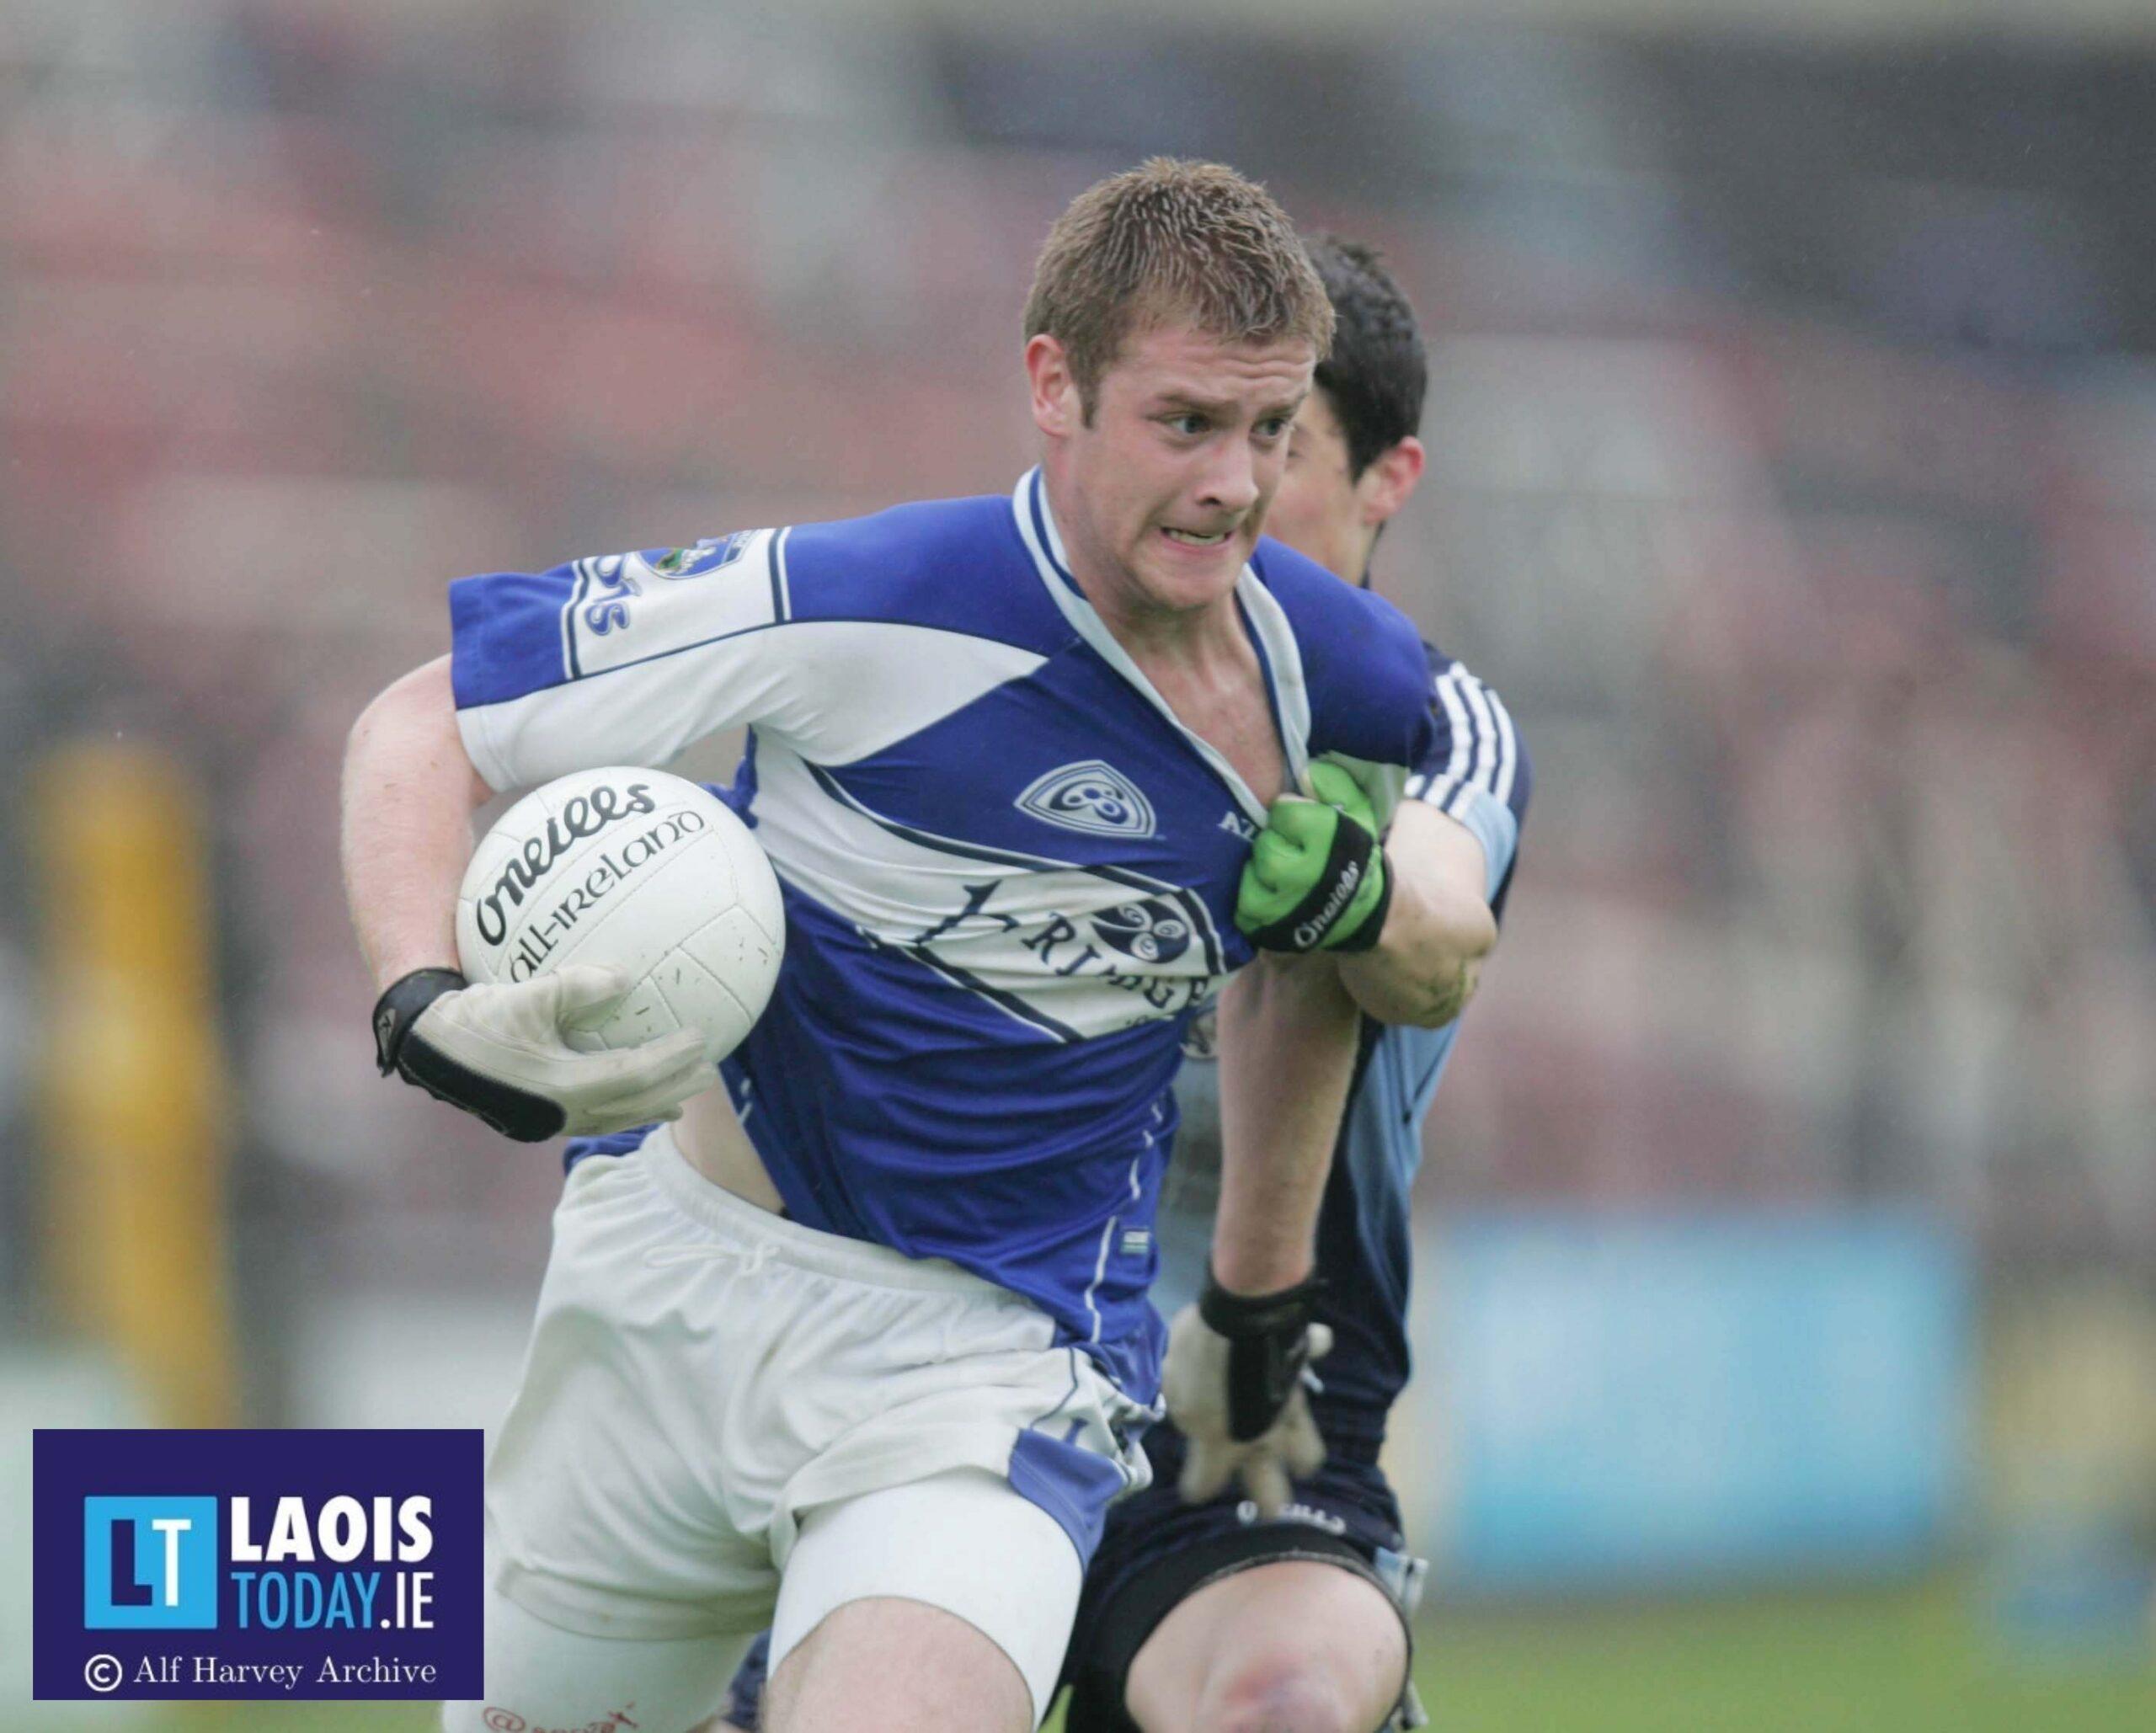 The Laois minor footballers beat Dublin in 2007